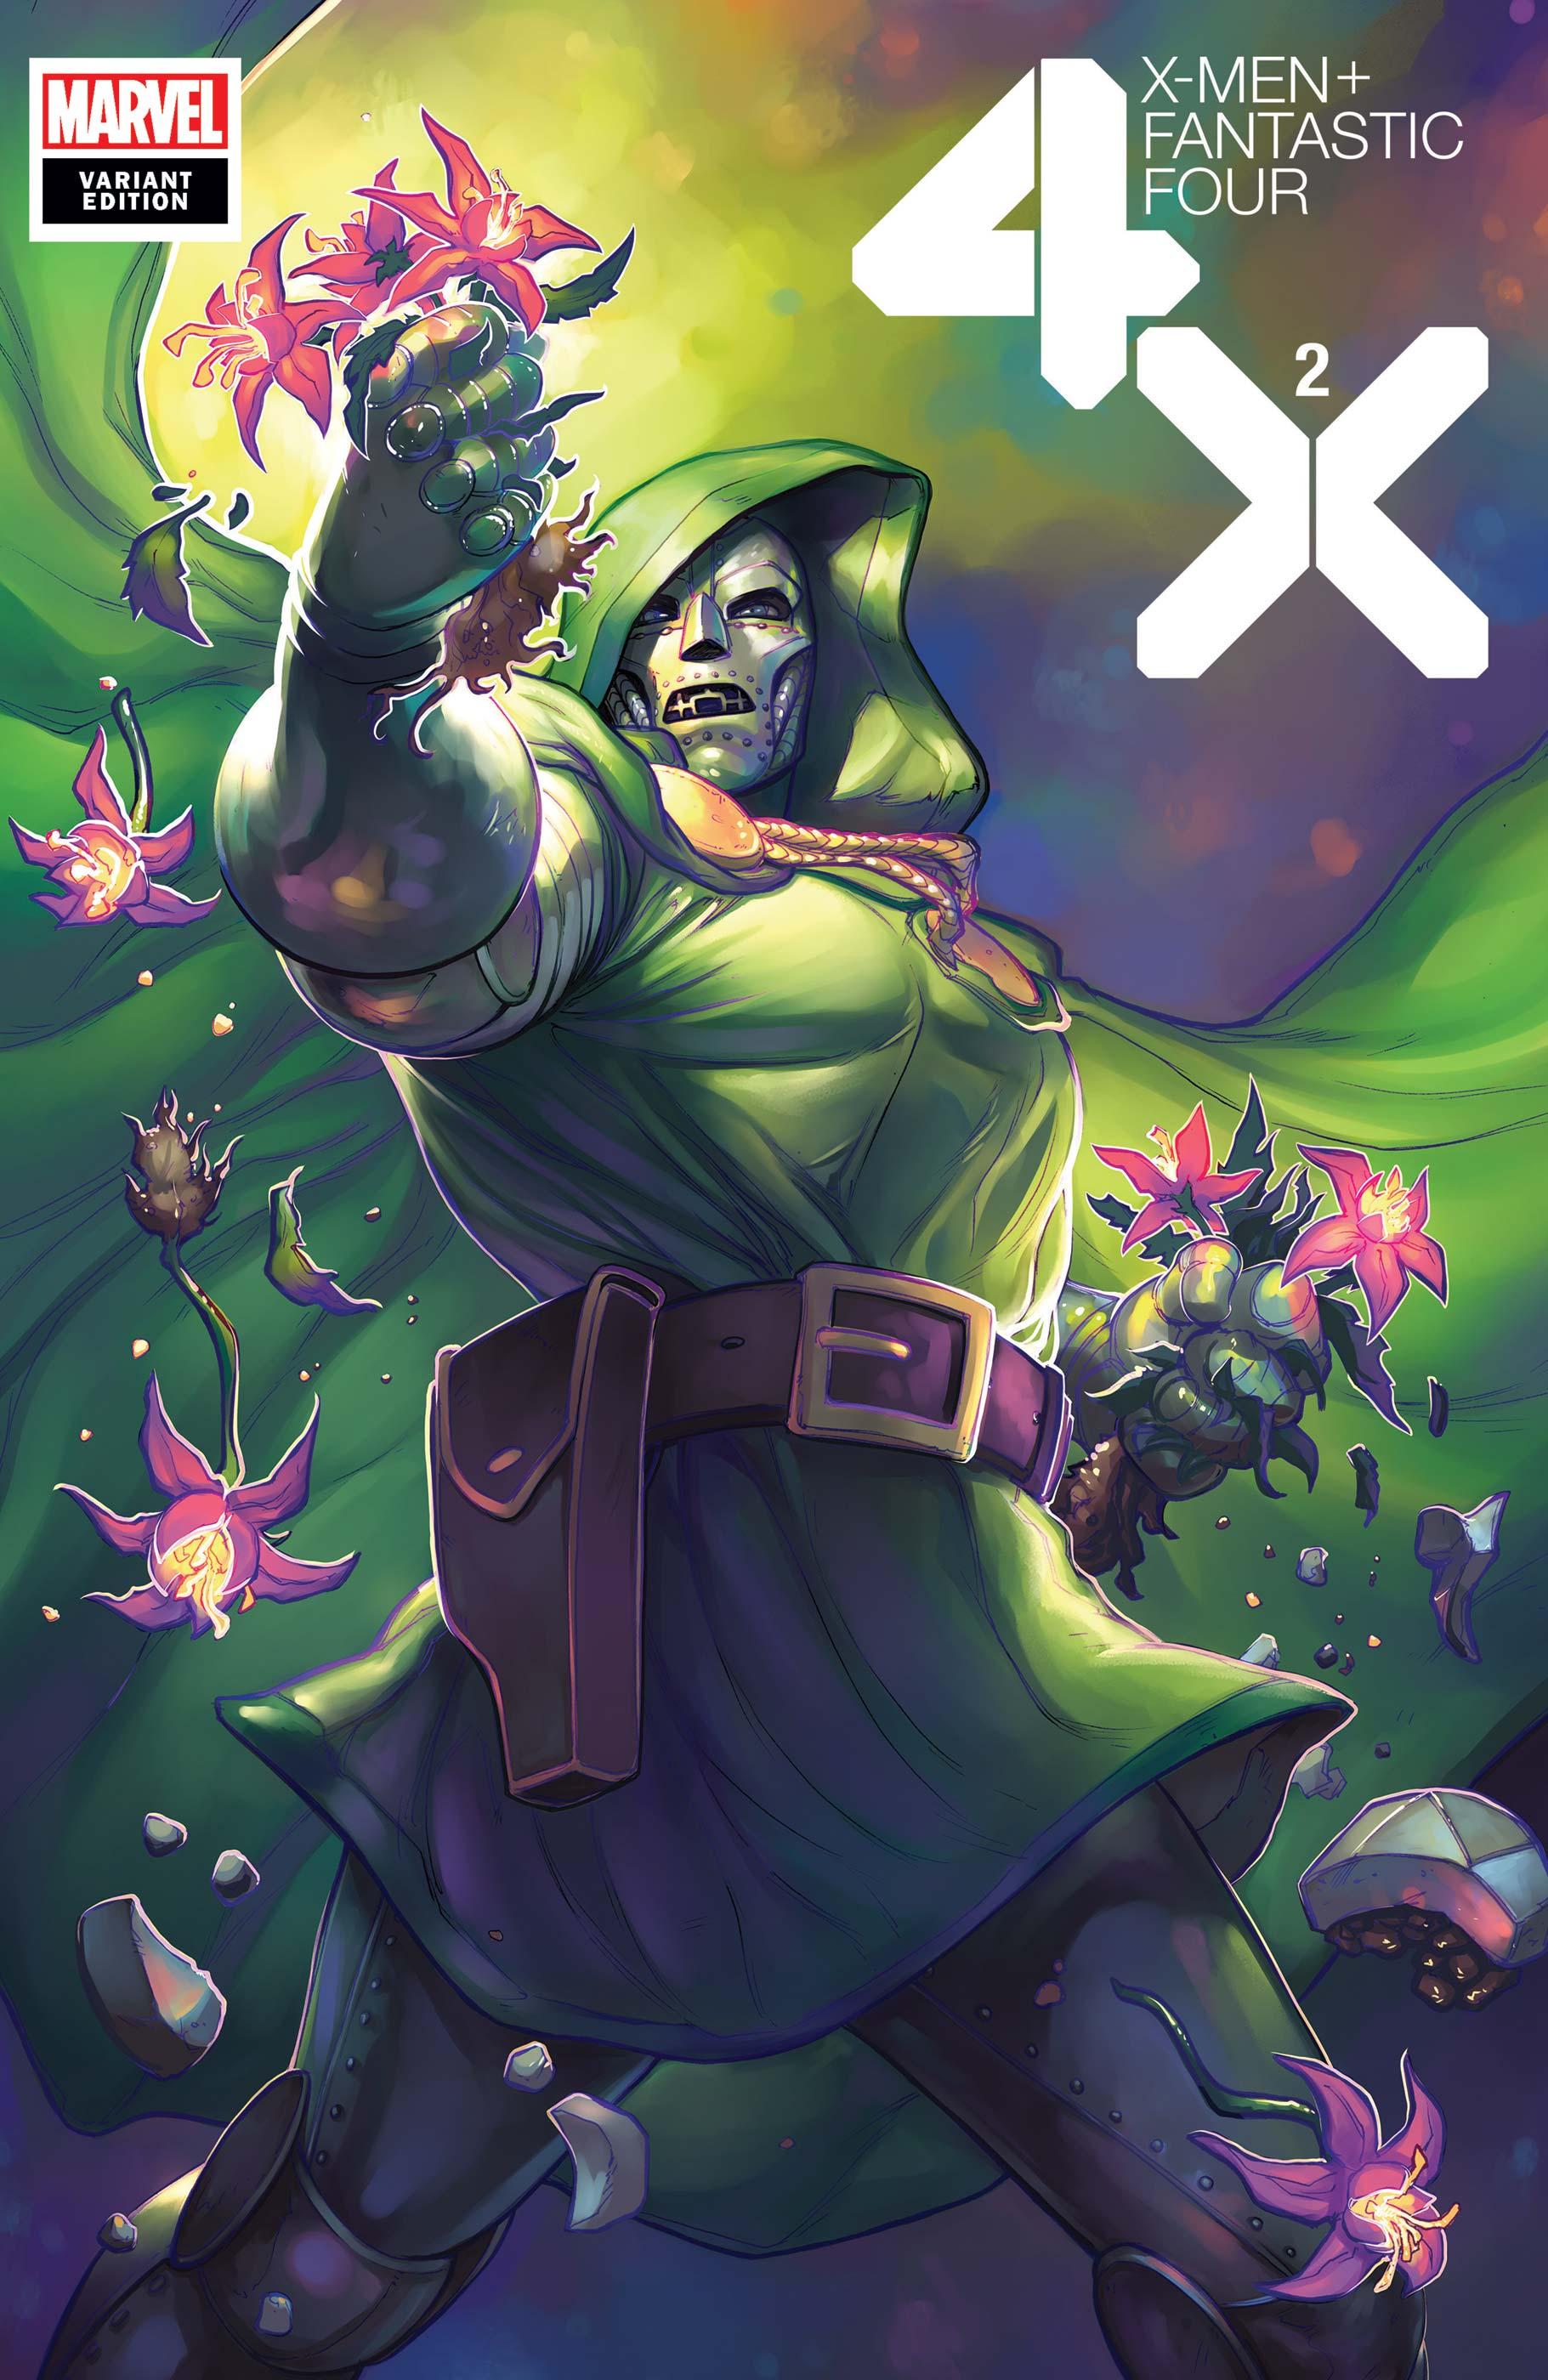 X-Men/Fantastic Four (2020) #2 (Variant)